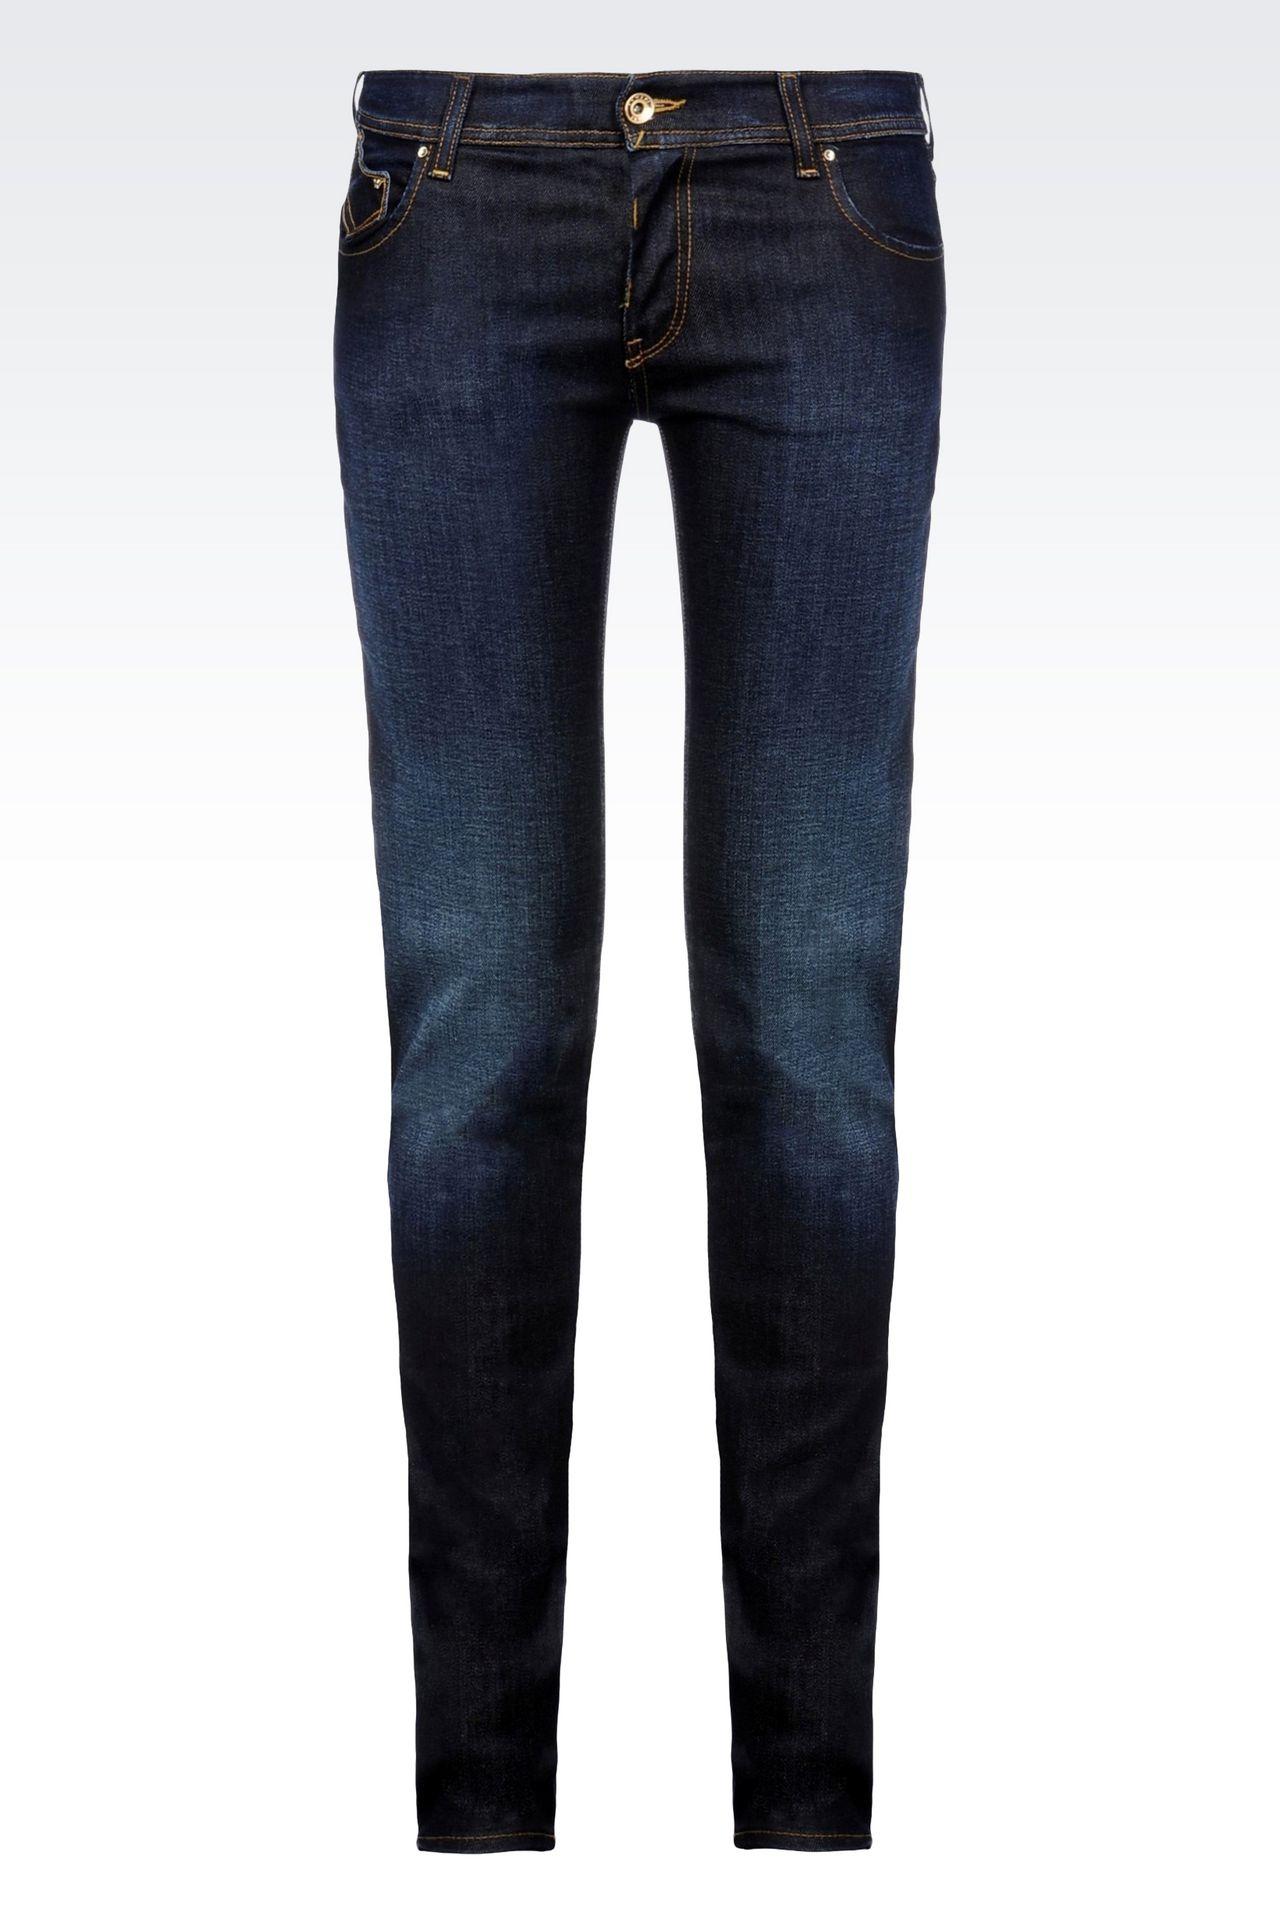 SLIM FIT DARK WASH JEANS: Jeans Women by Armani - 0